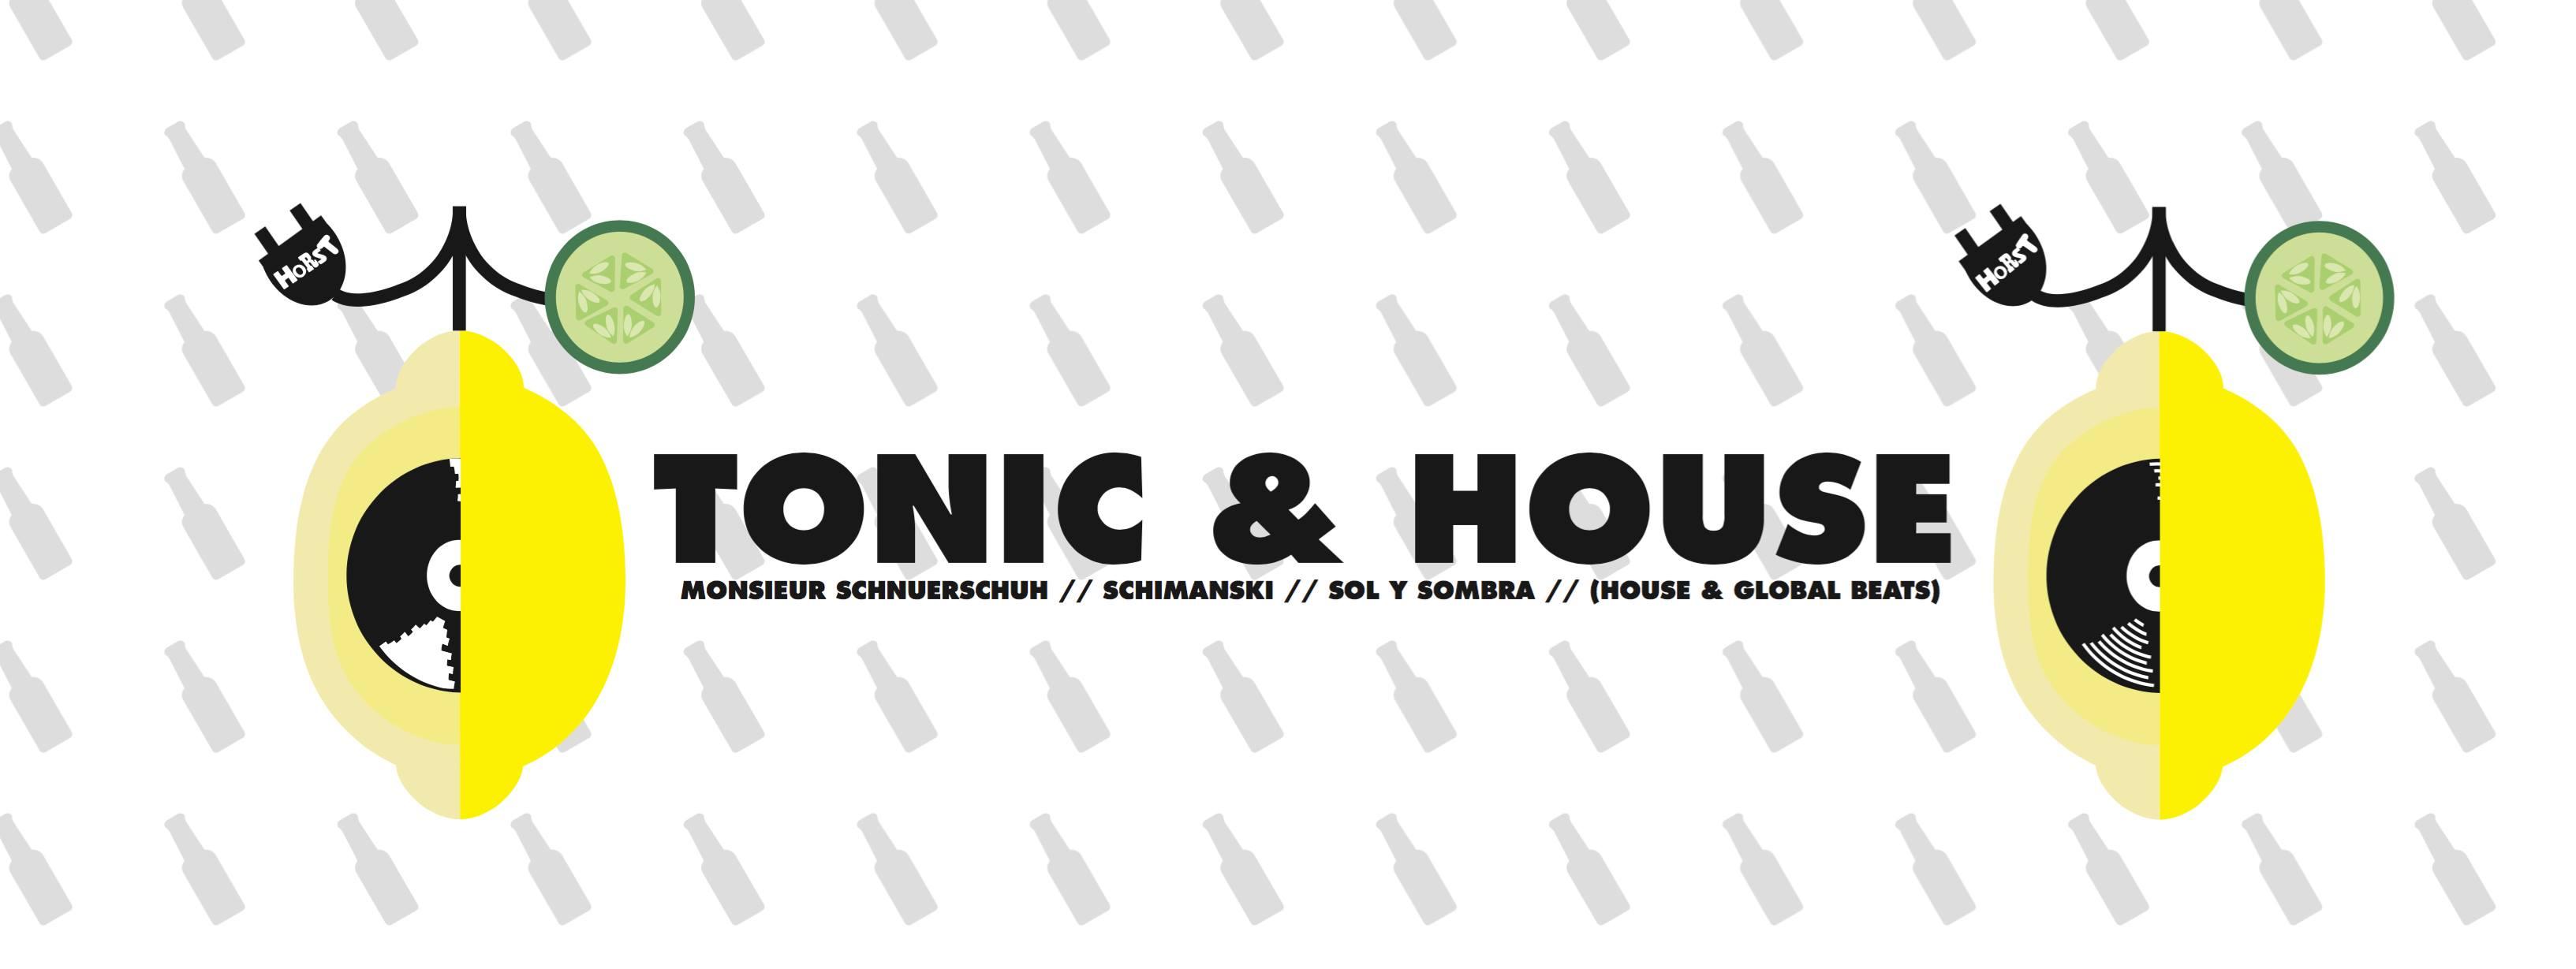 tonic_u_house